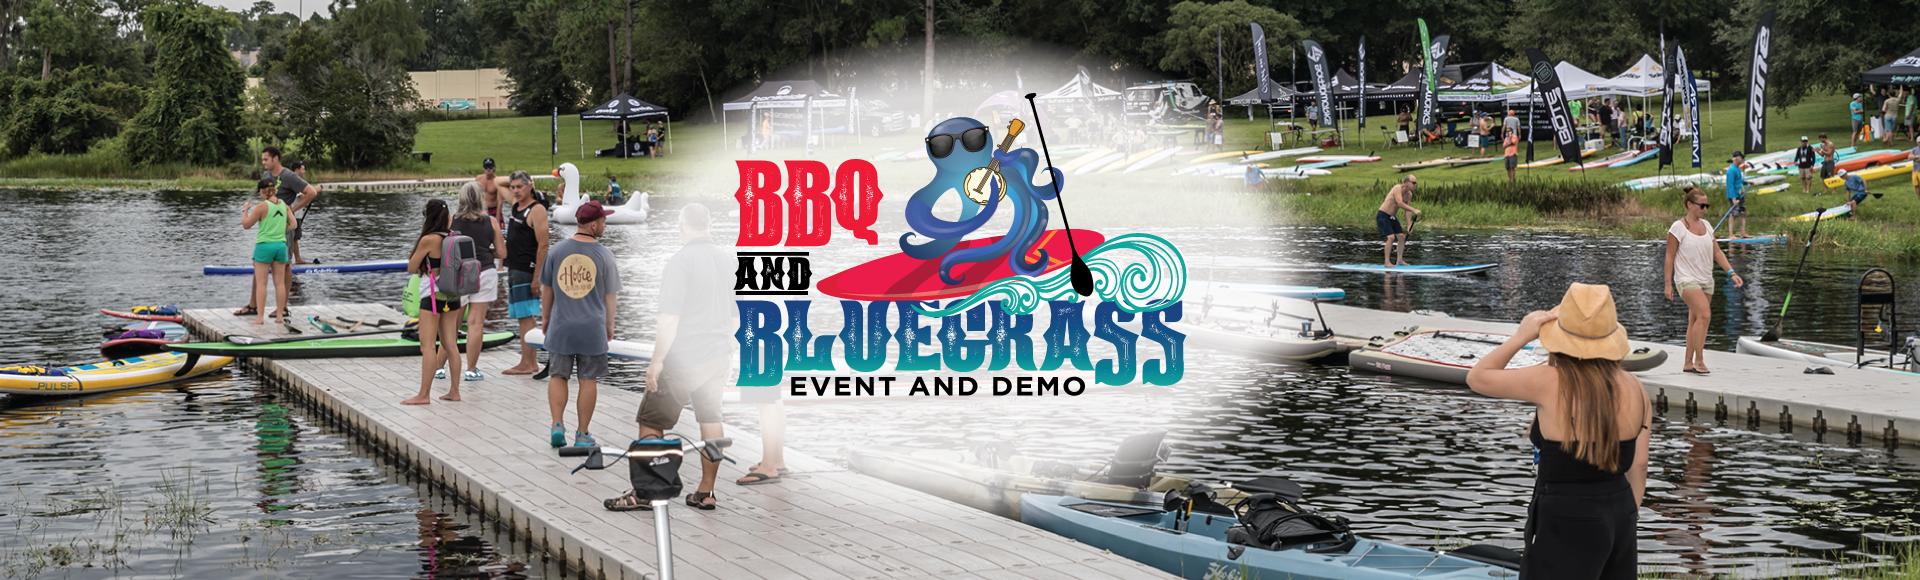 BBQ & Bluegrass Event and Demo